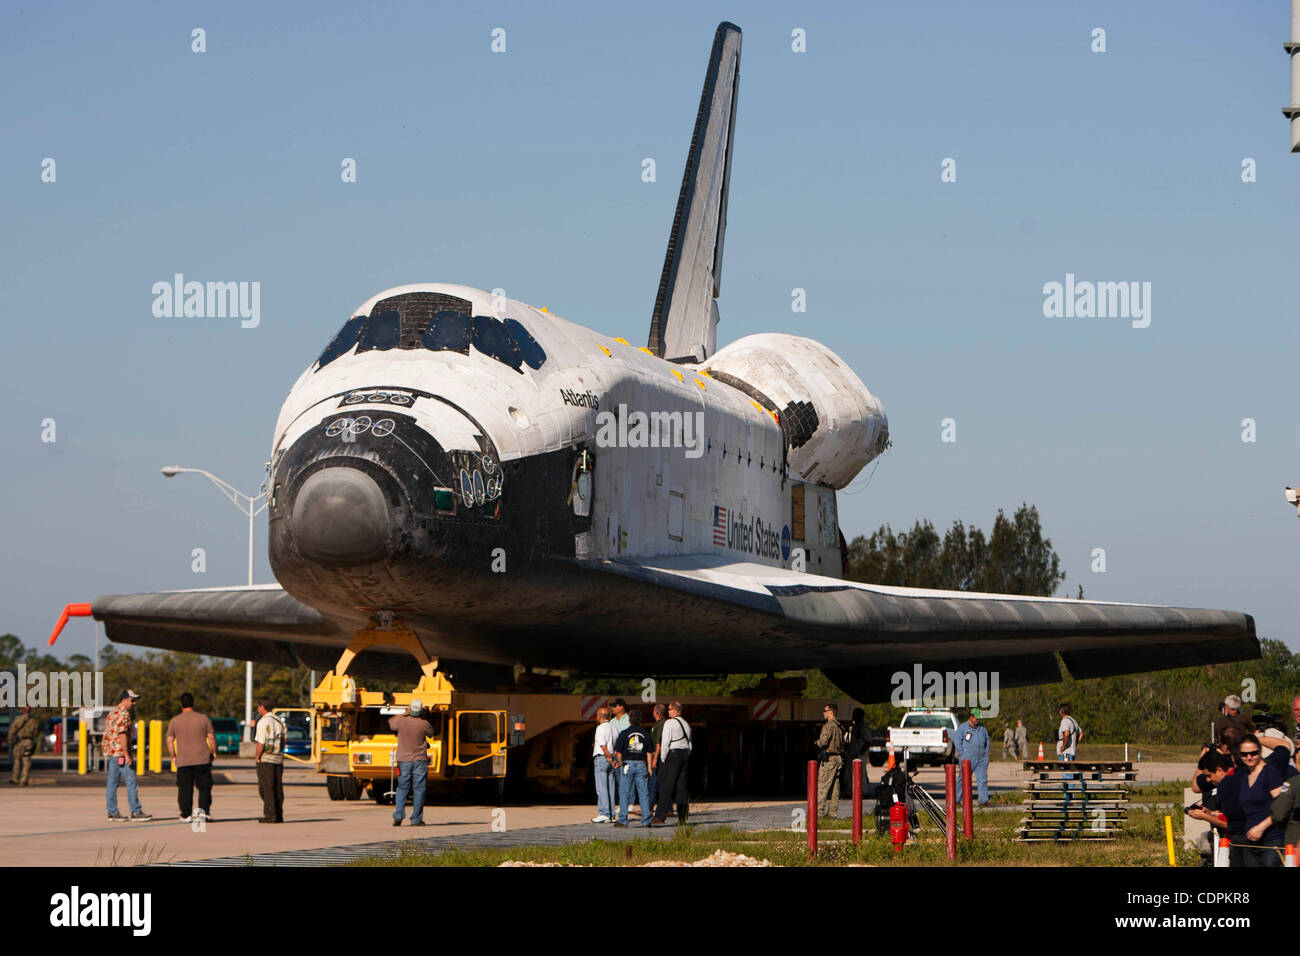 us space shuttle atlantis - photo #21